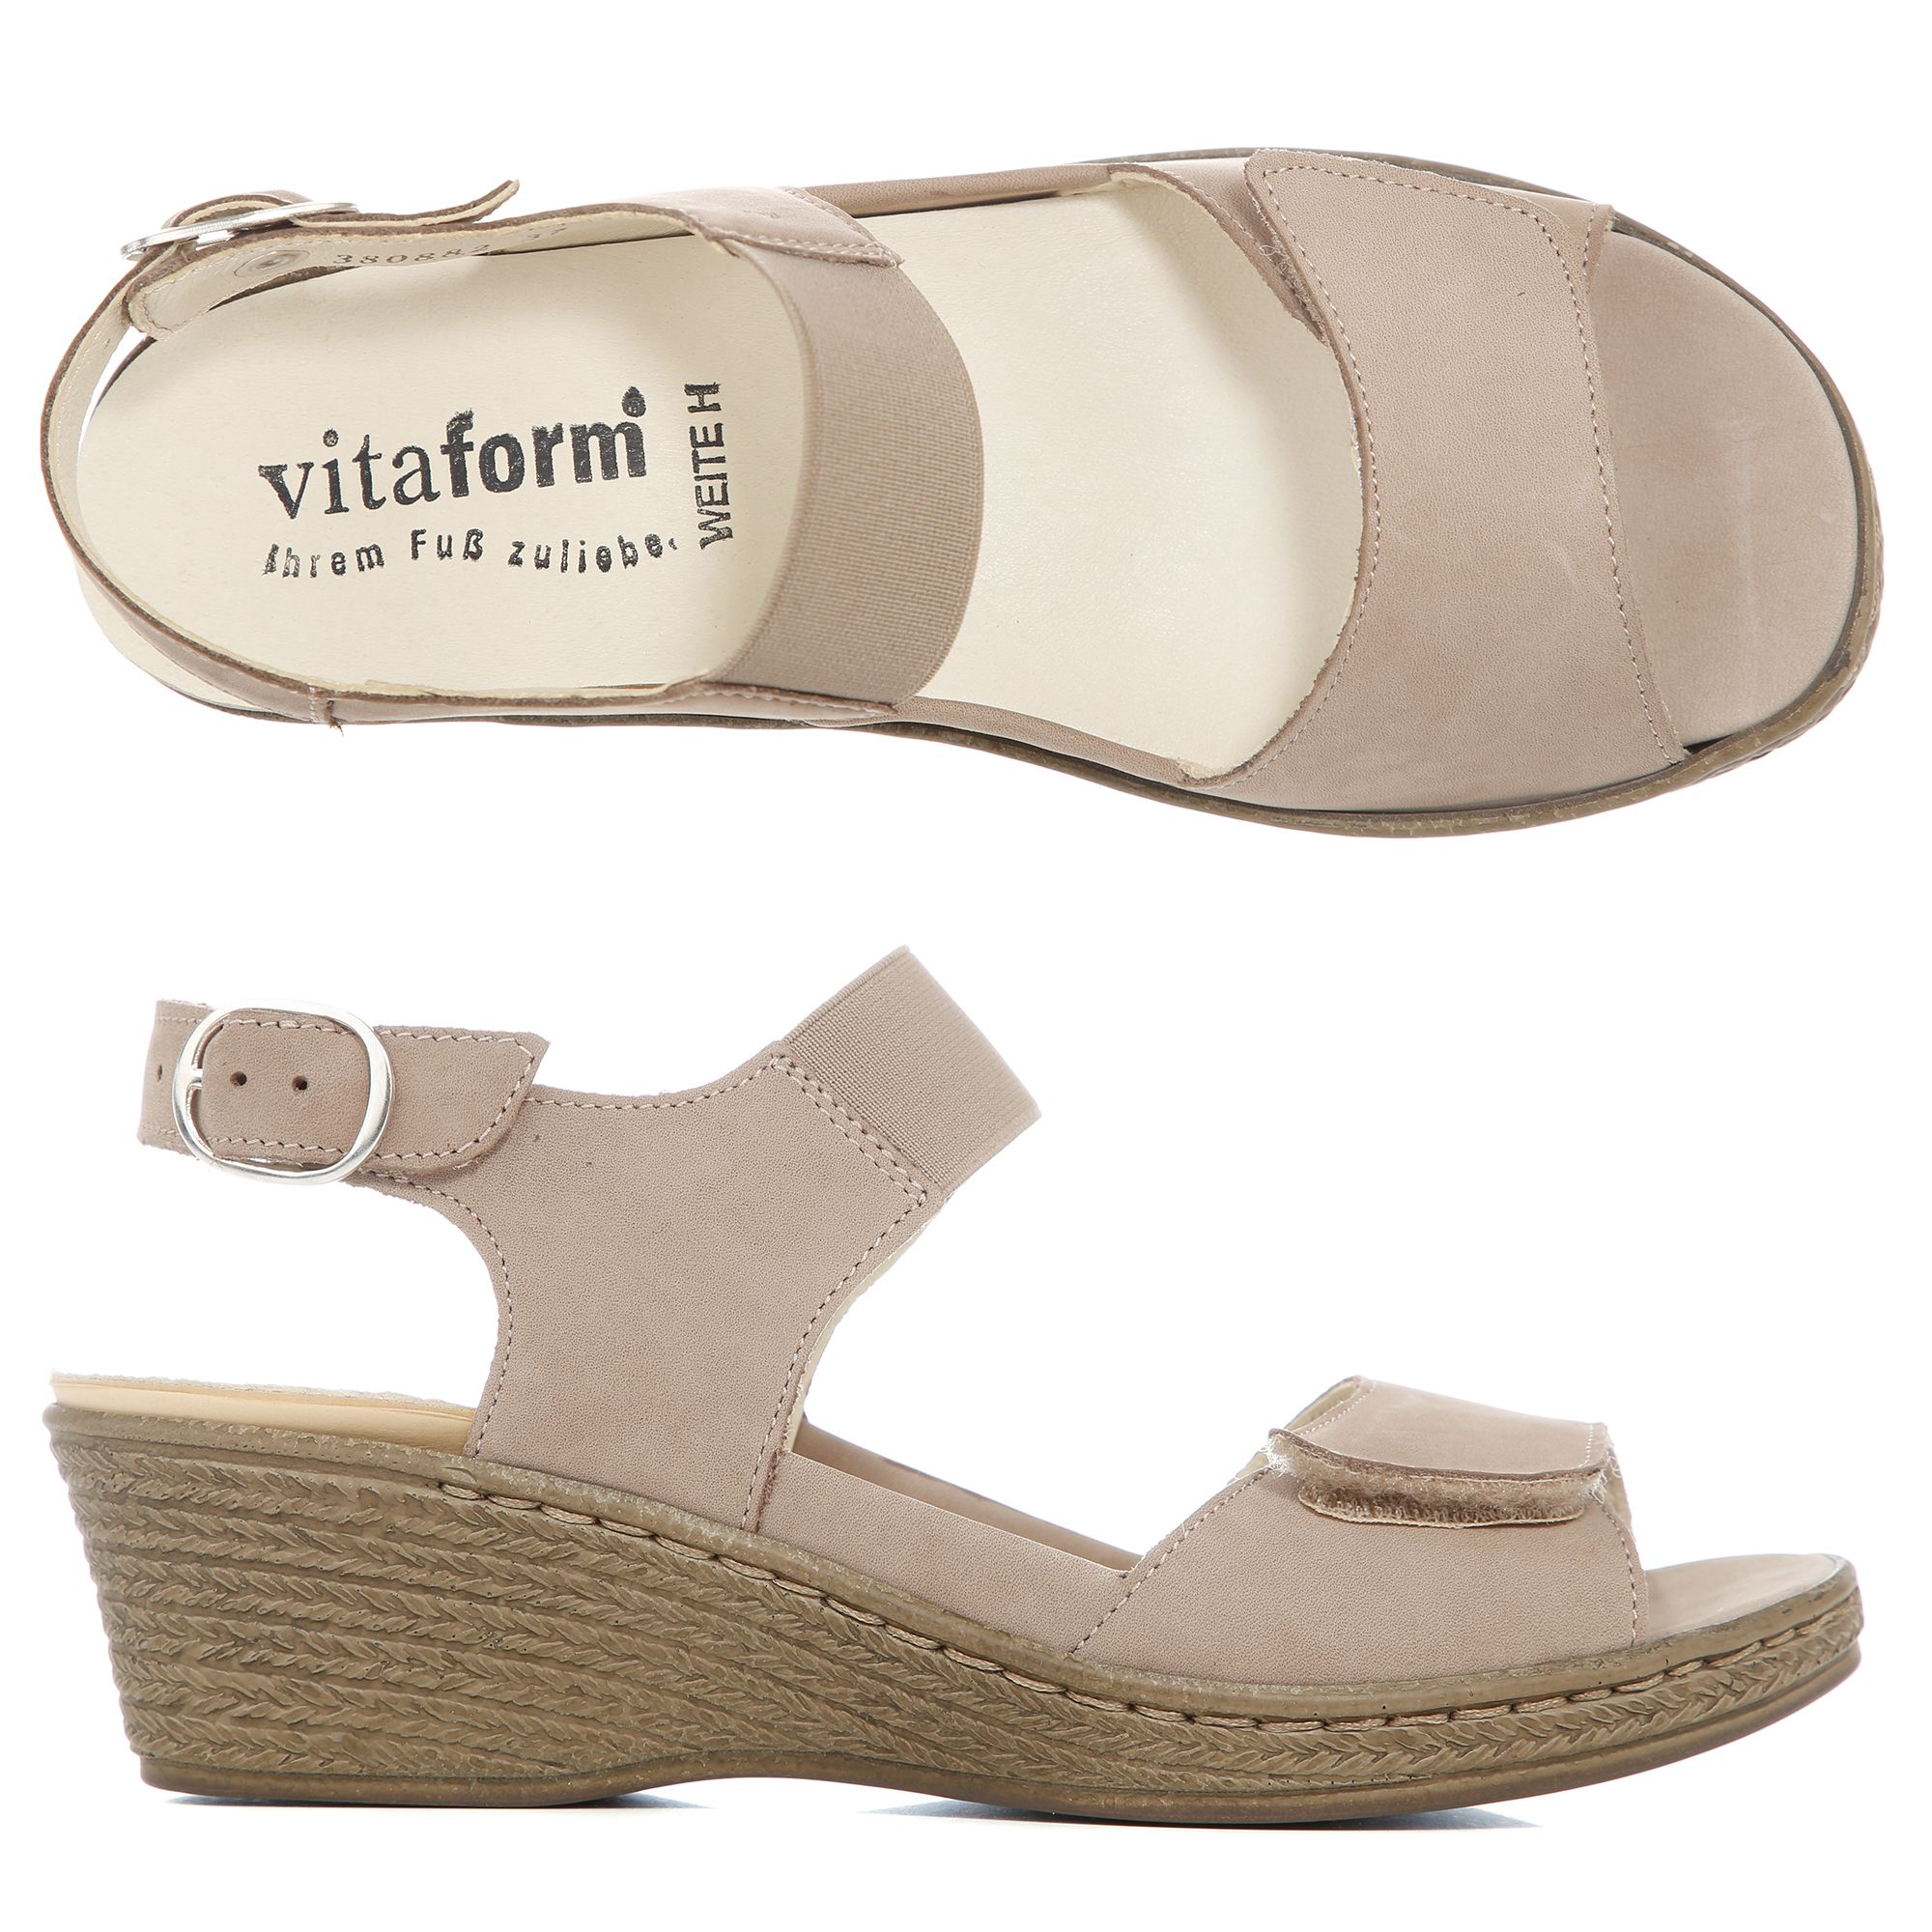 Keilabsatz Bast — Nubukleder Vitaform Sandalette Optik Austauschfußbett ZiOXTPku